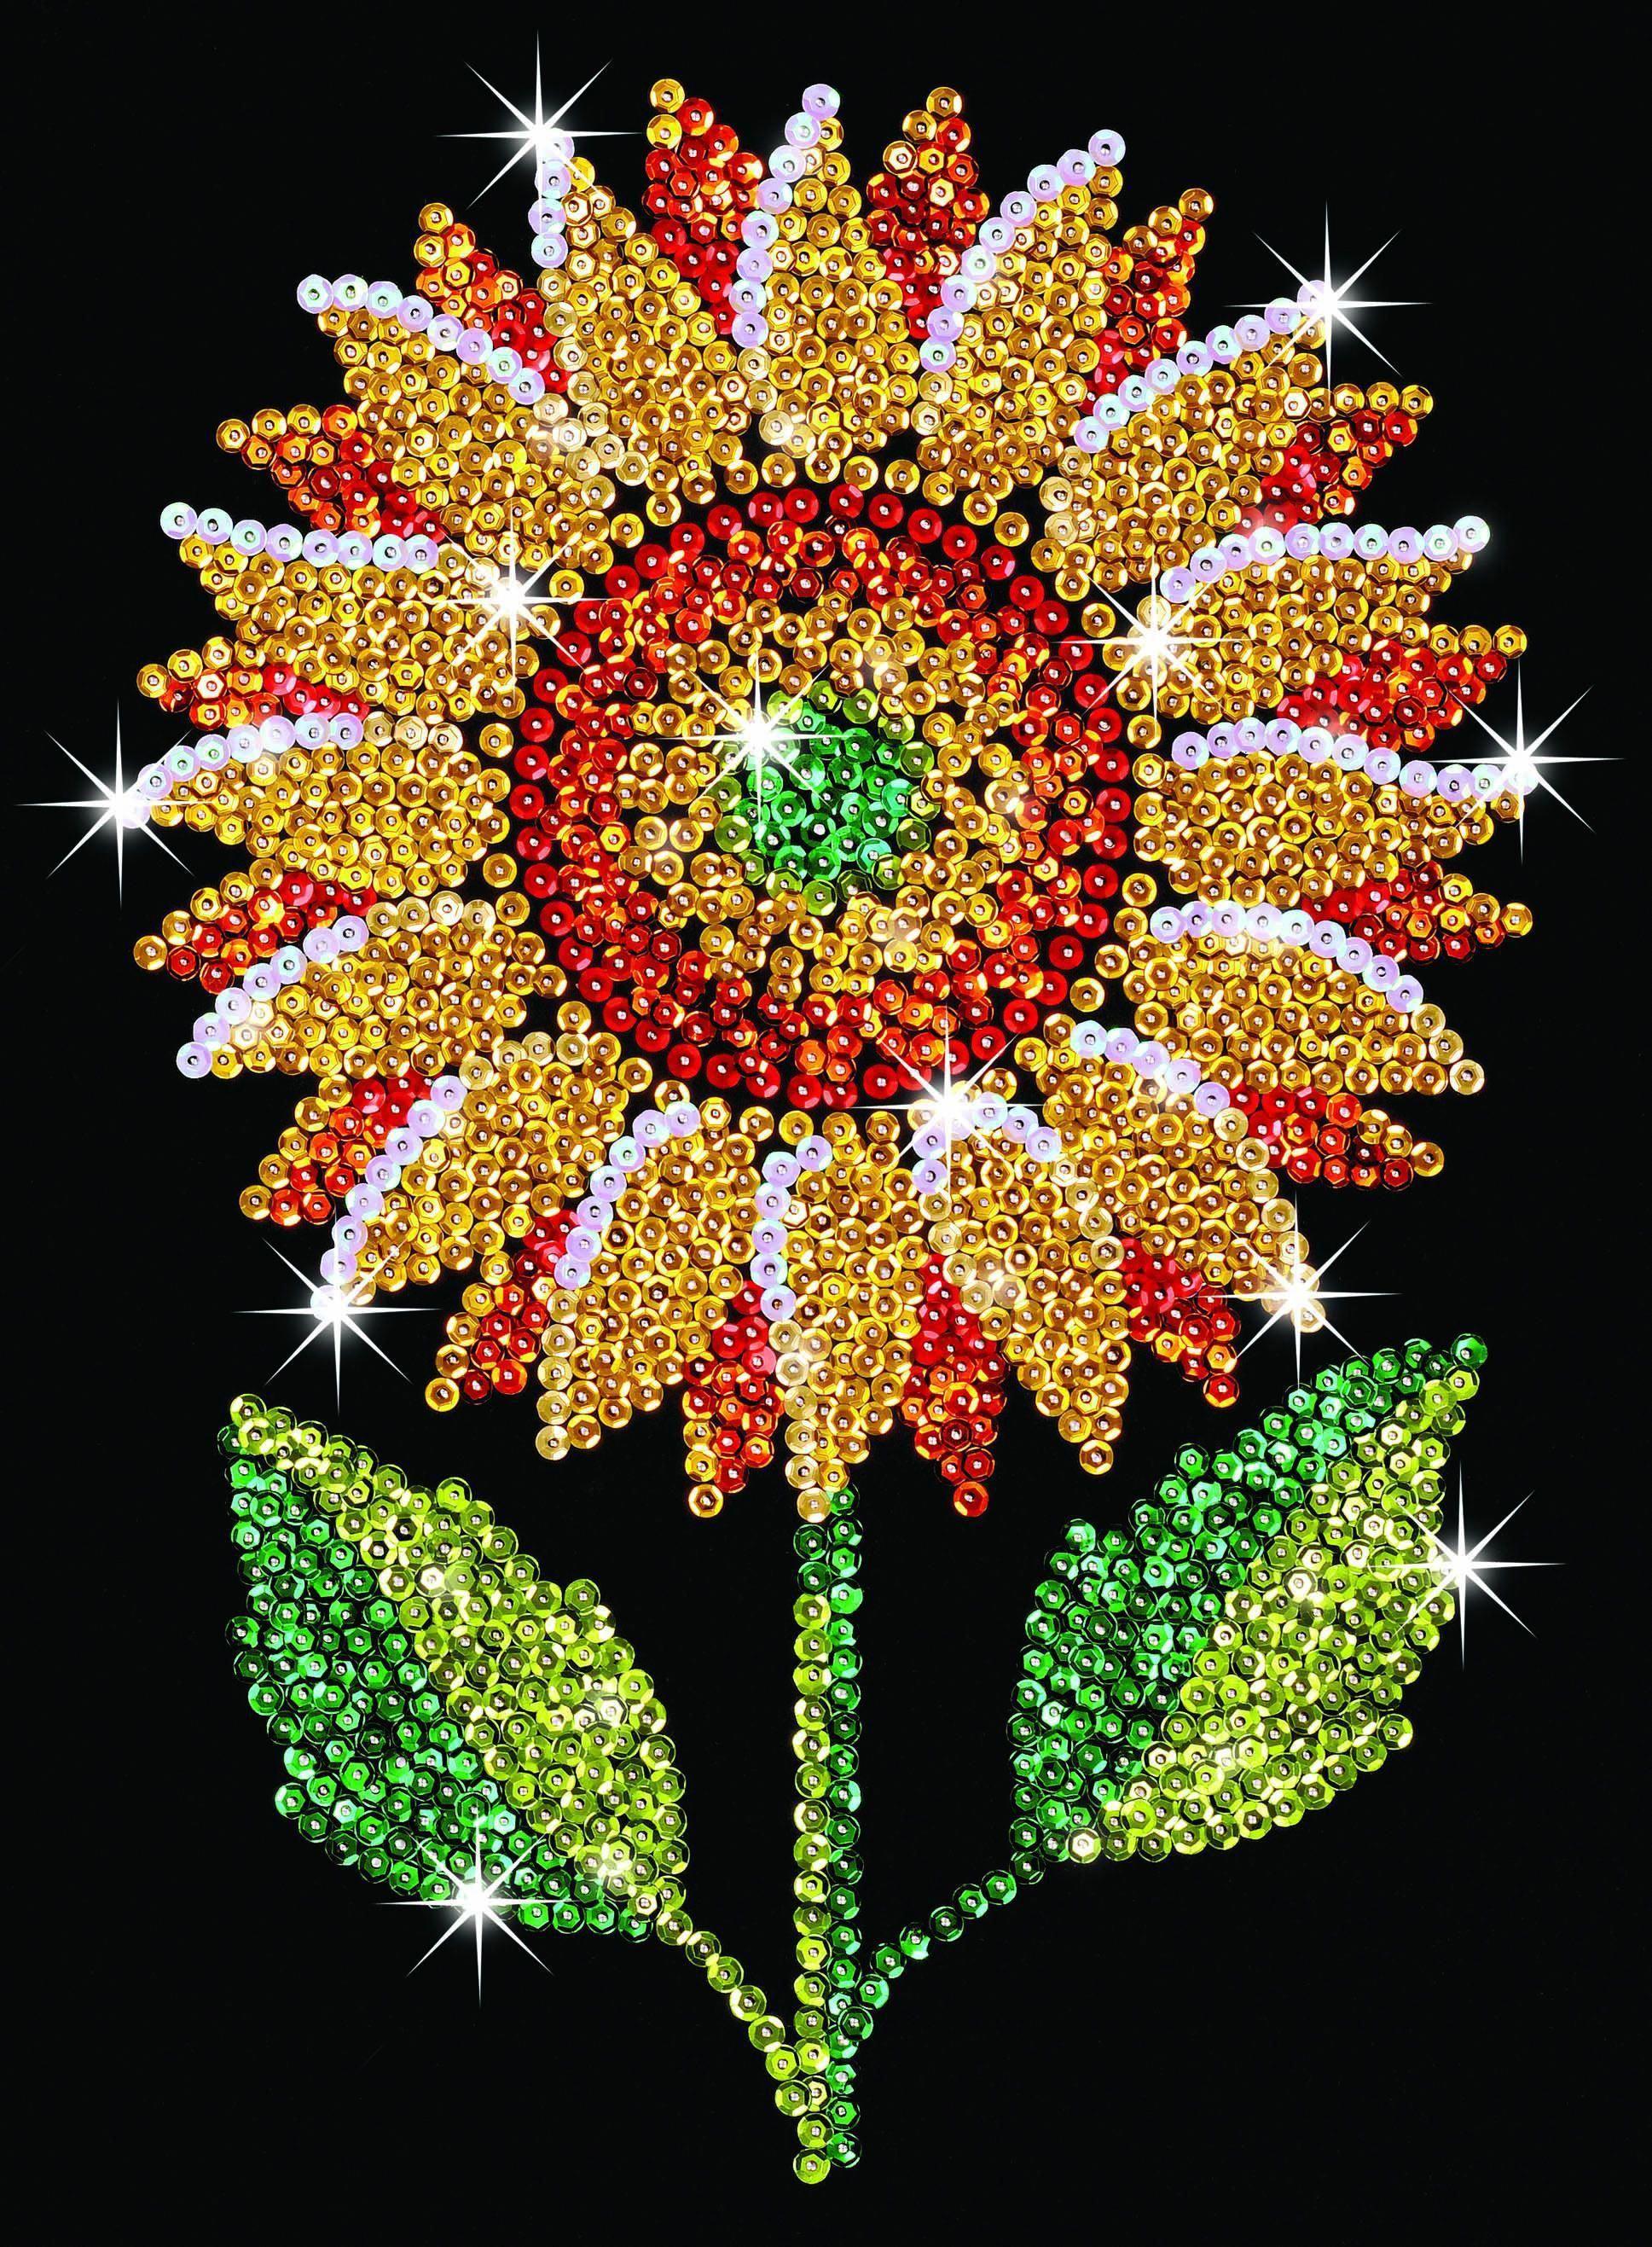 Kit De Arte Para Niños-Diamante Art-KITS Manualidades De Niños-obras de arte de cristal de lentejuelas